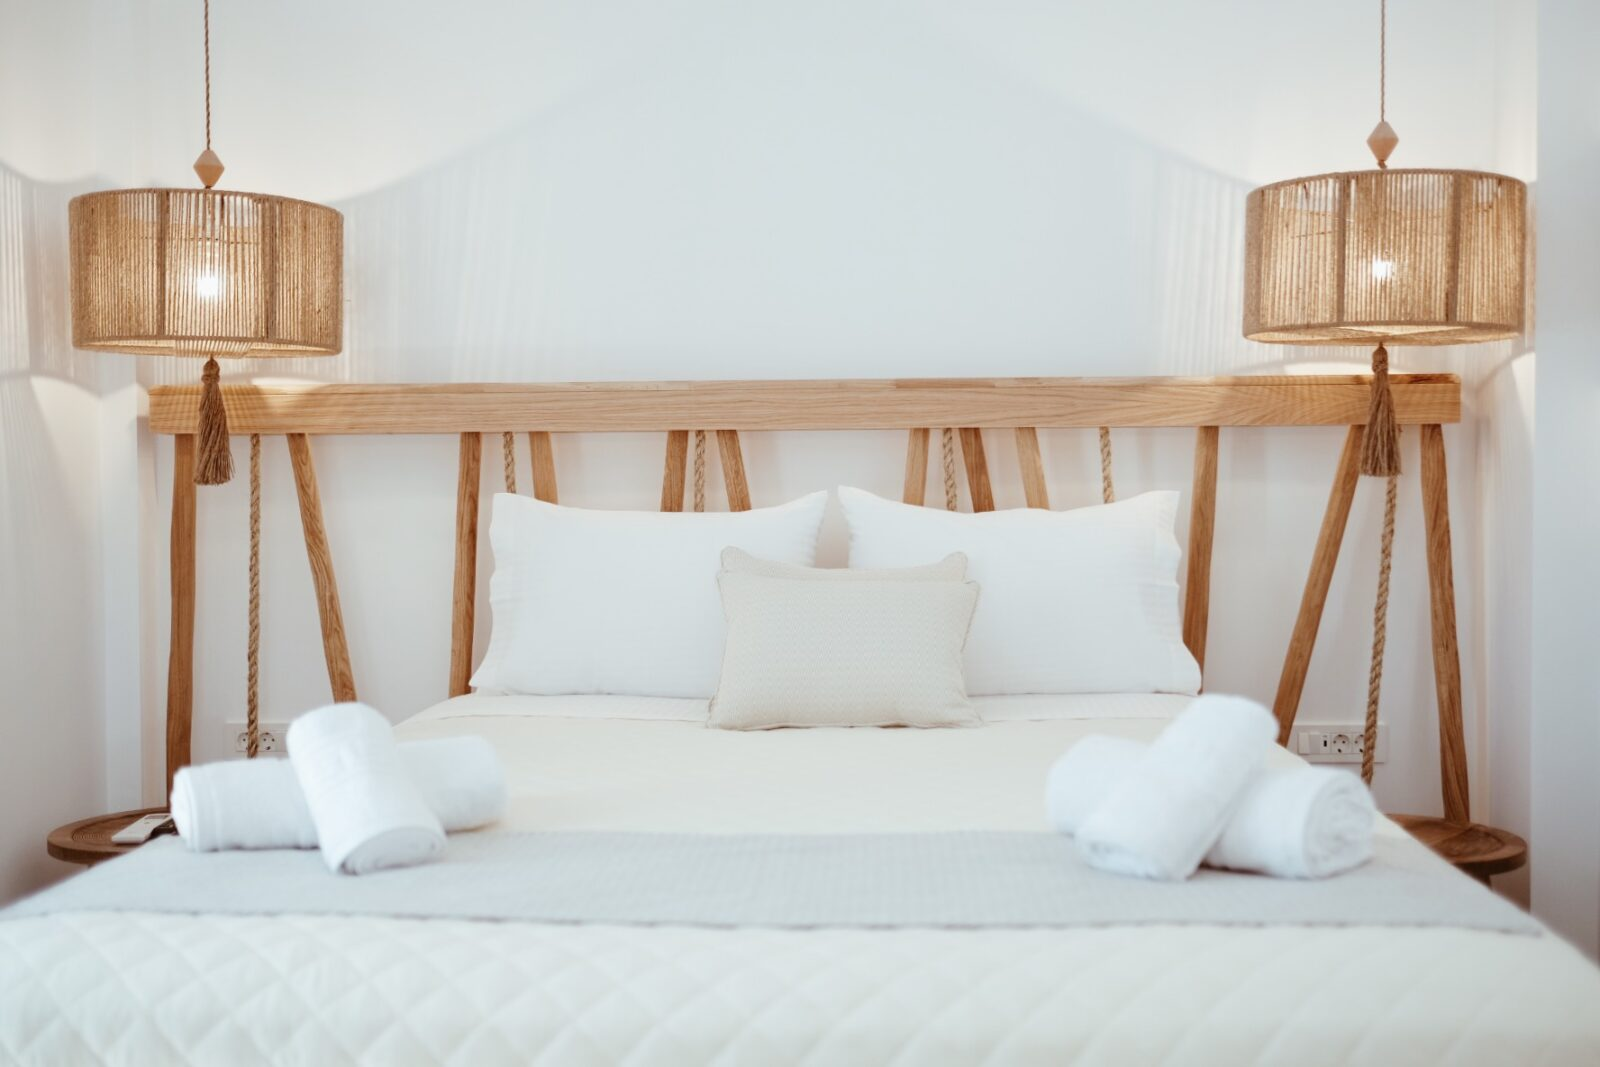 Alafropetra Luxury Suite 2 - Master bedroom